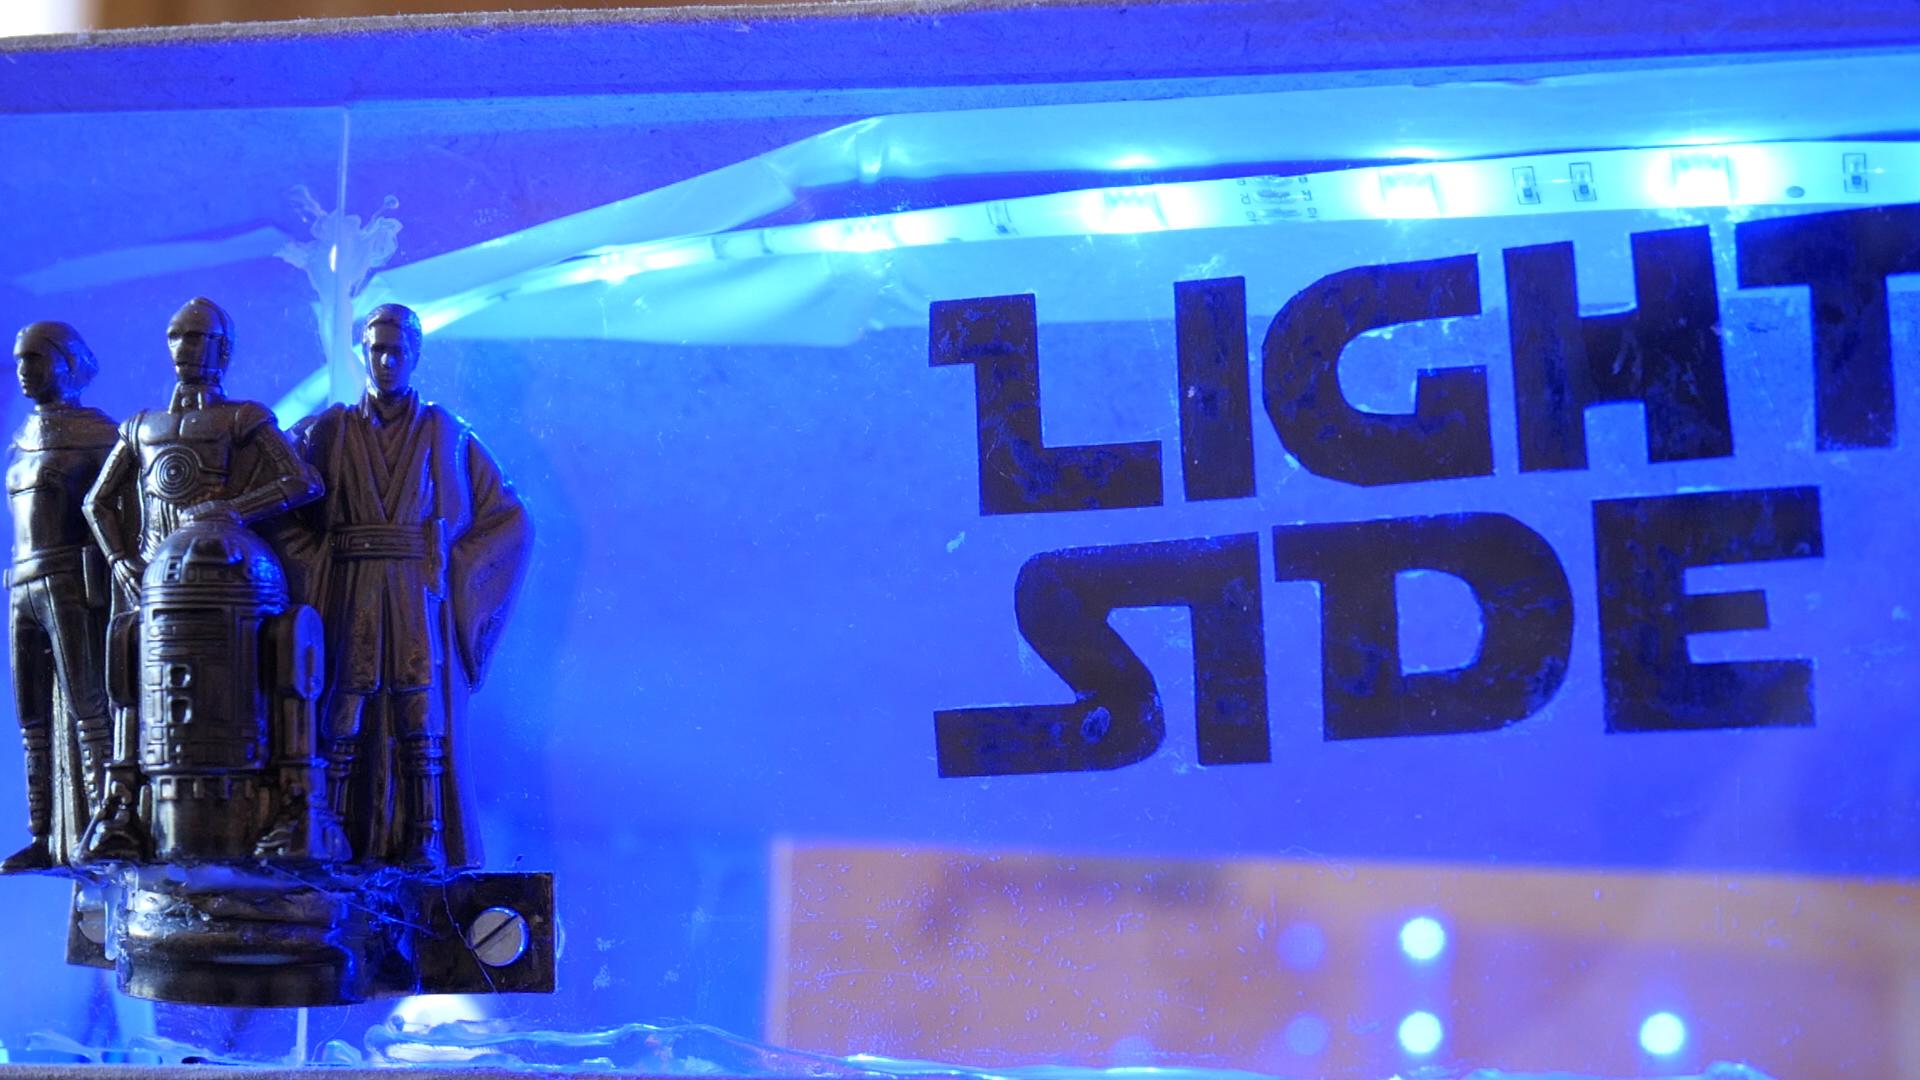 Arcade Automat LED